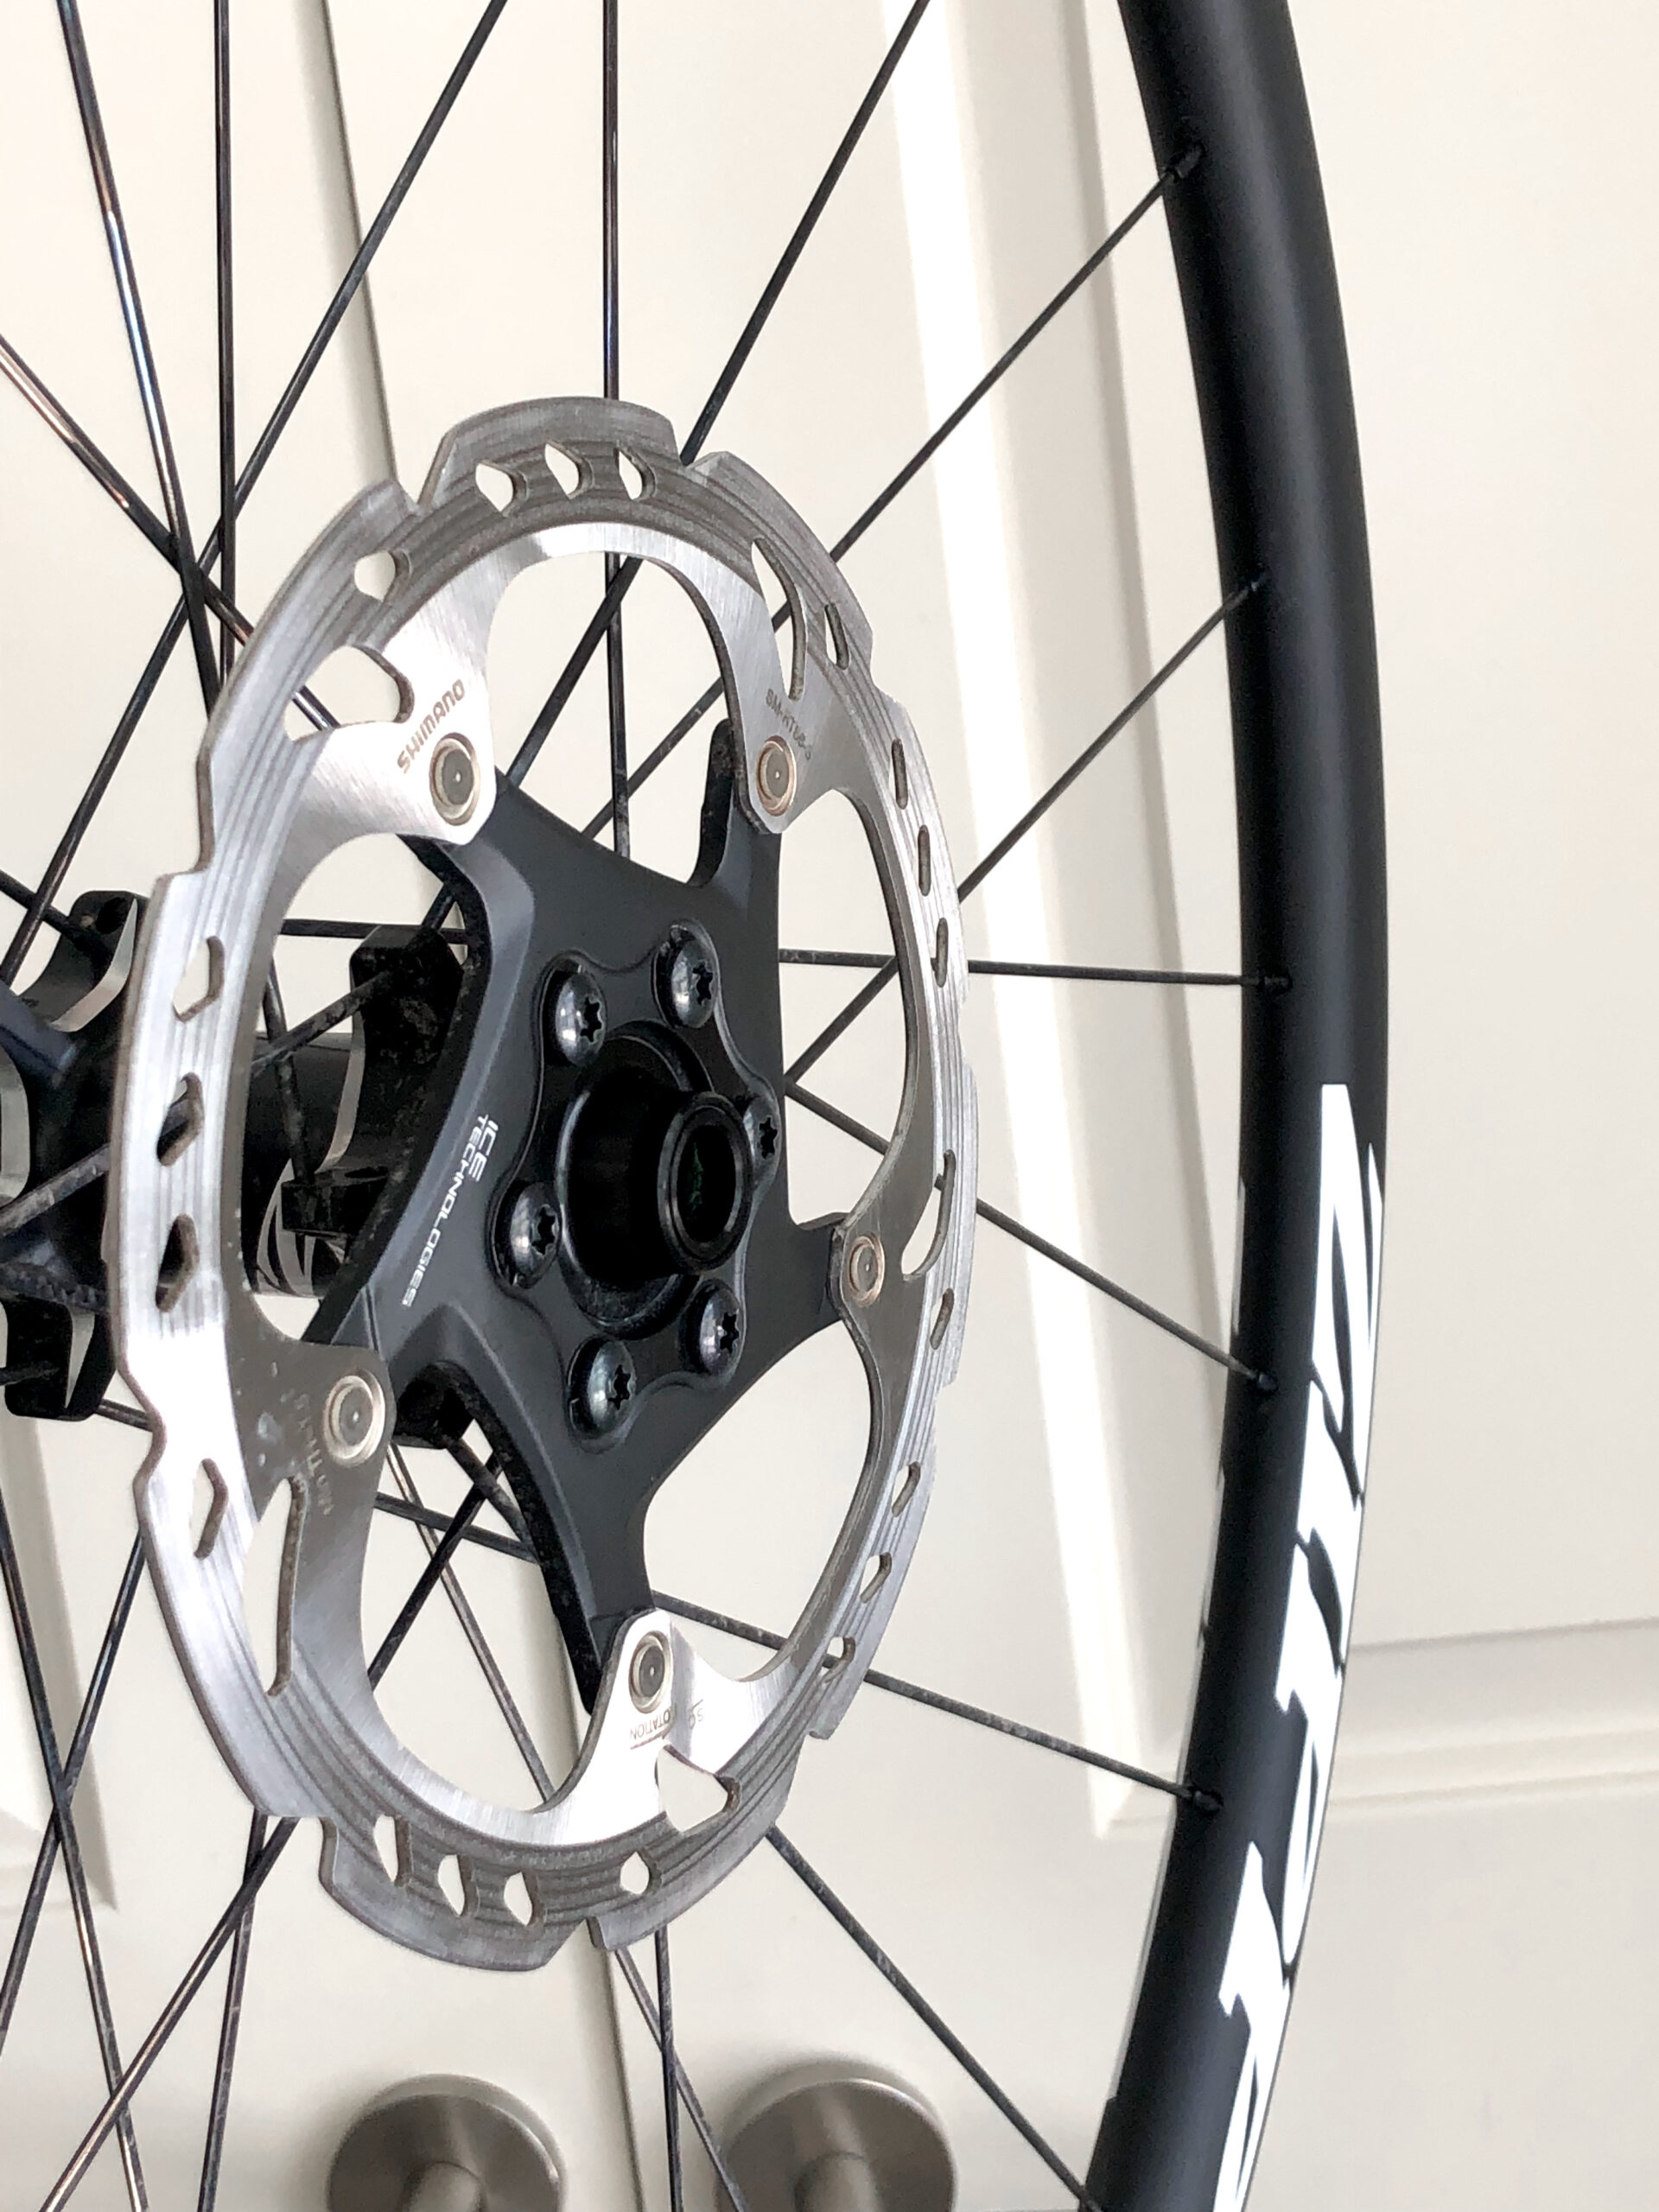 Zipp 30 Course Clincher Tubeless Disc Brake Wheelset w/ Rotors 11 speed